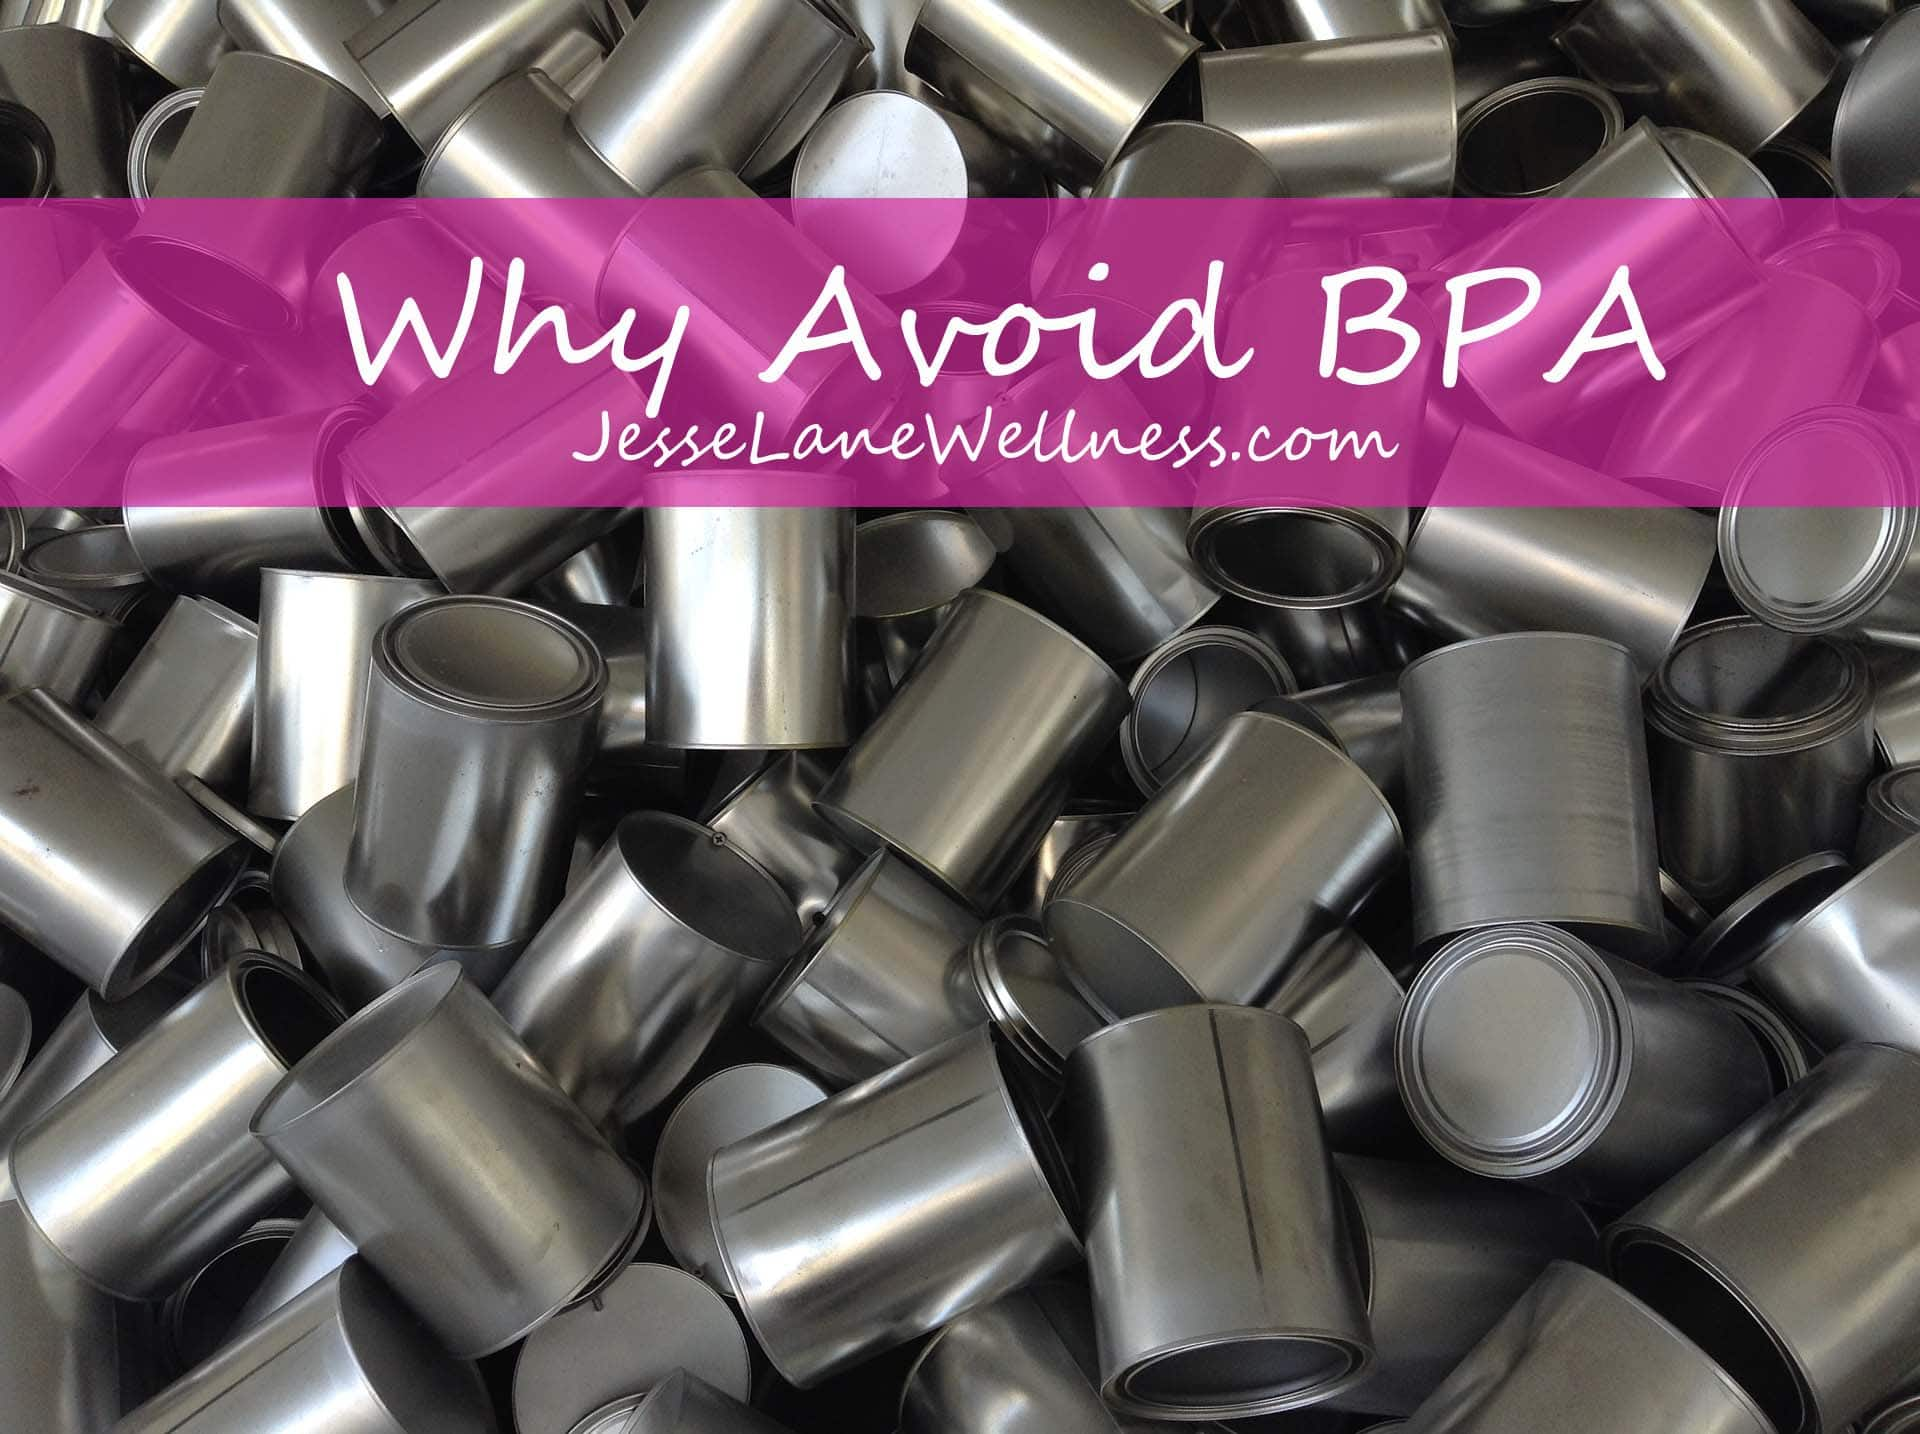 Why Avoid BPA by @jesselwellness #BPA #jlwcookbook